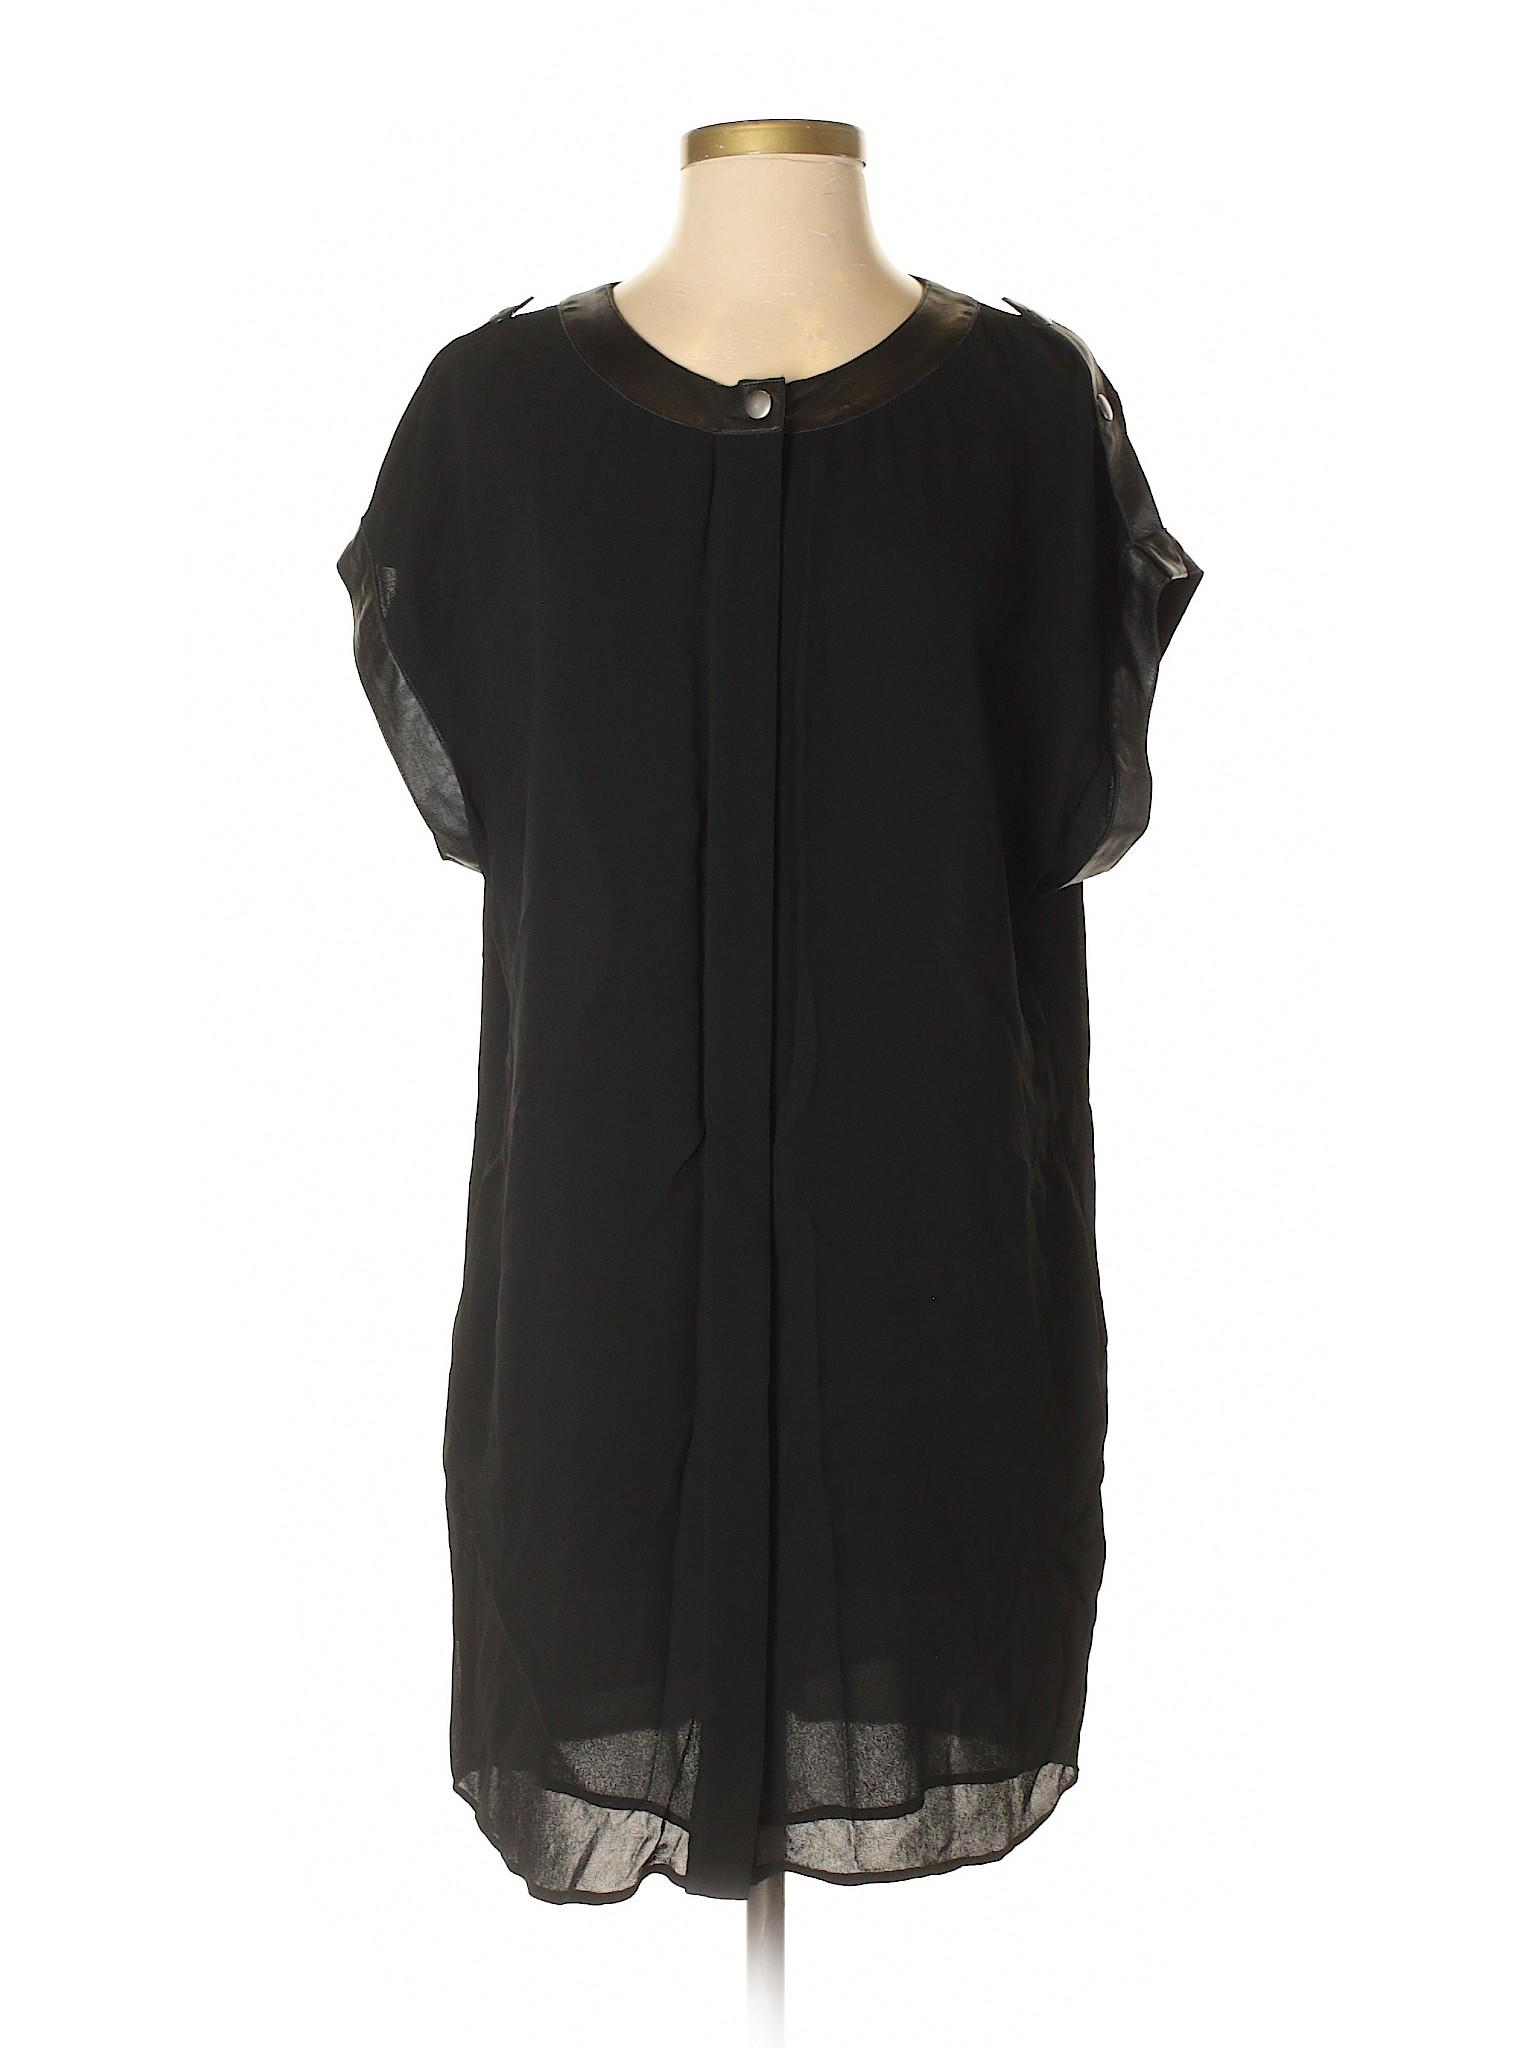 Zoe Boutique Casual winter Rachel Dress qxAAYX1Ew